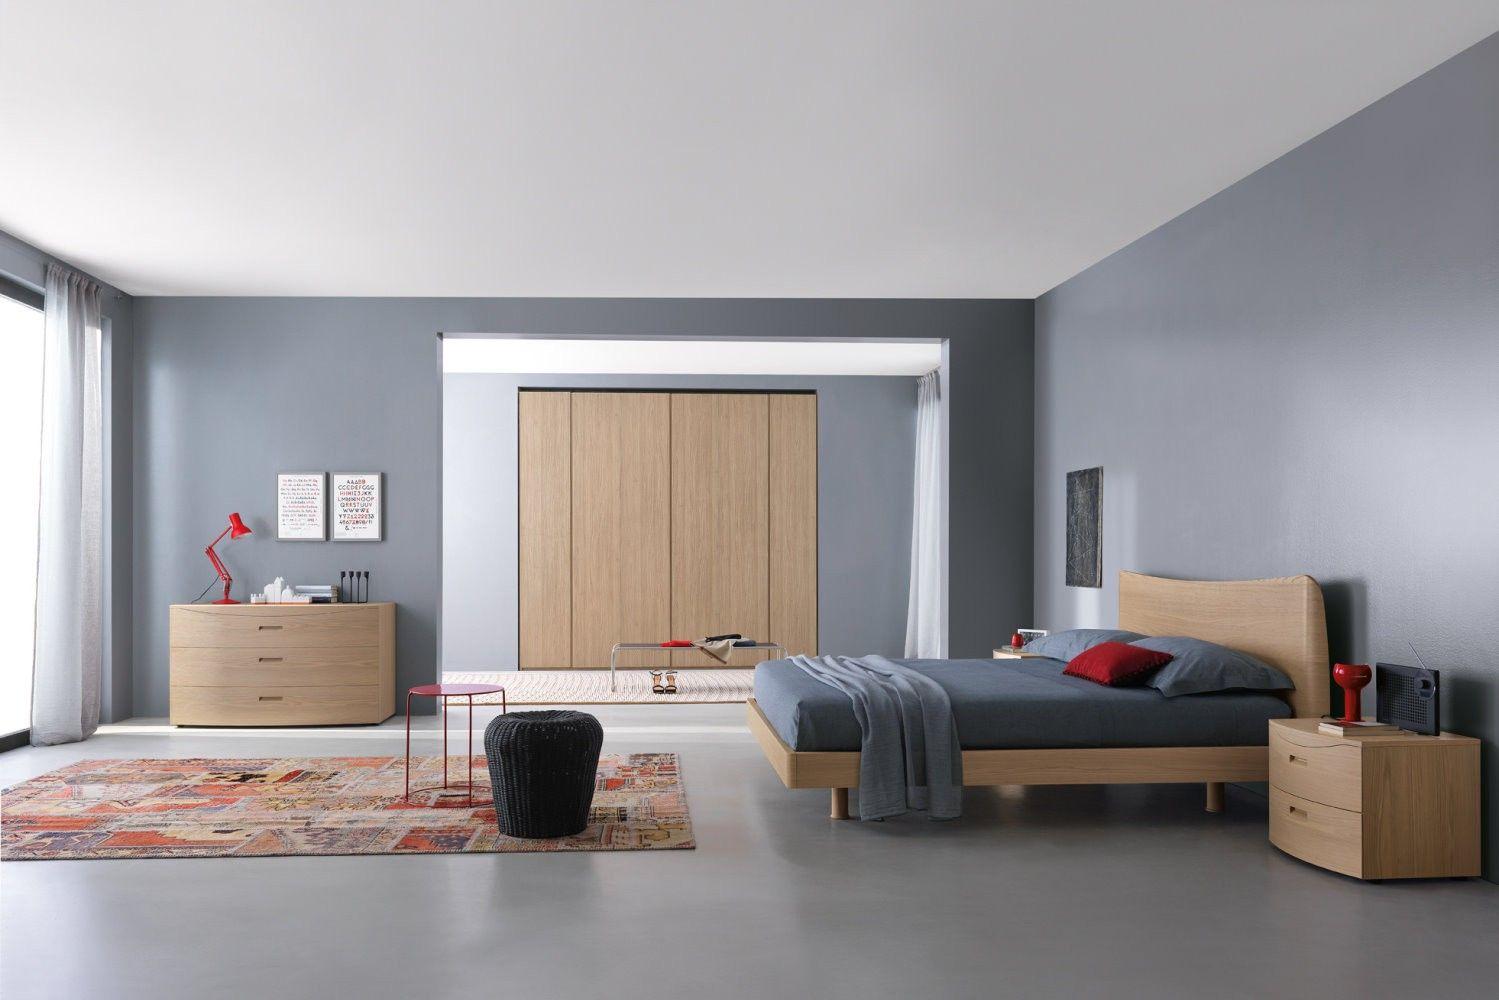 Camera da letto moderna 451 napol it napol zona notte pinterest arredamento and cameras - Camera da letto moderna ...